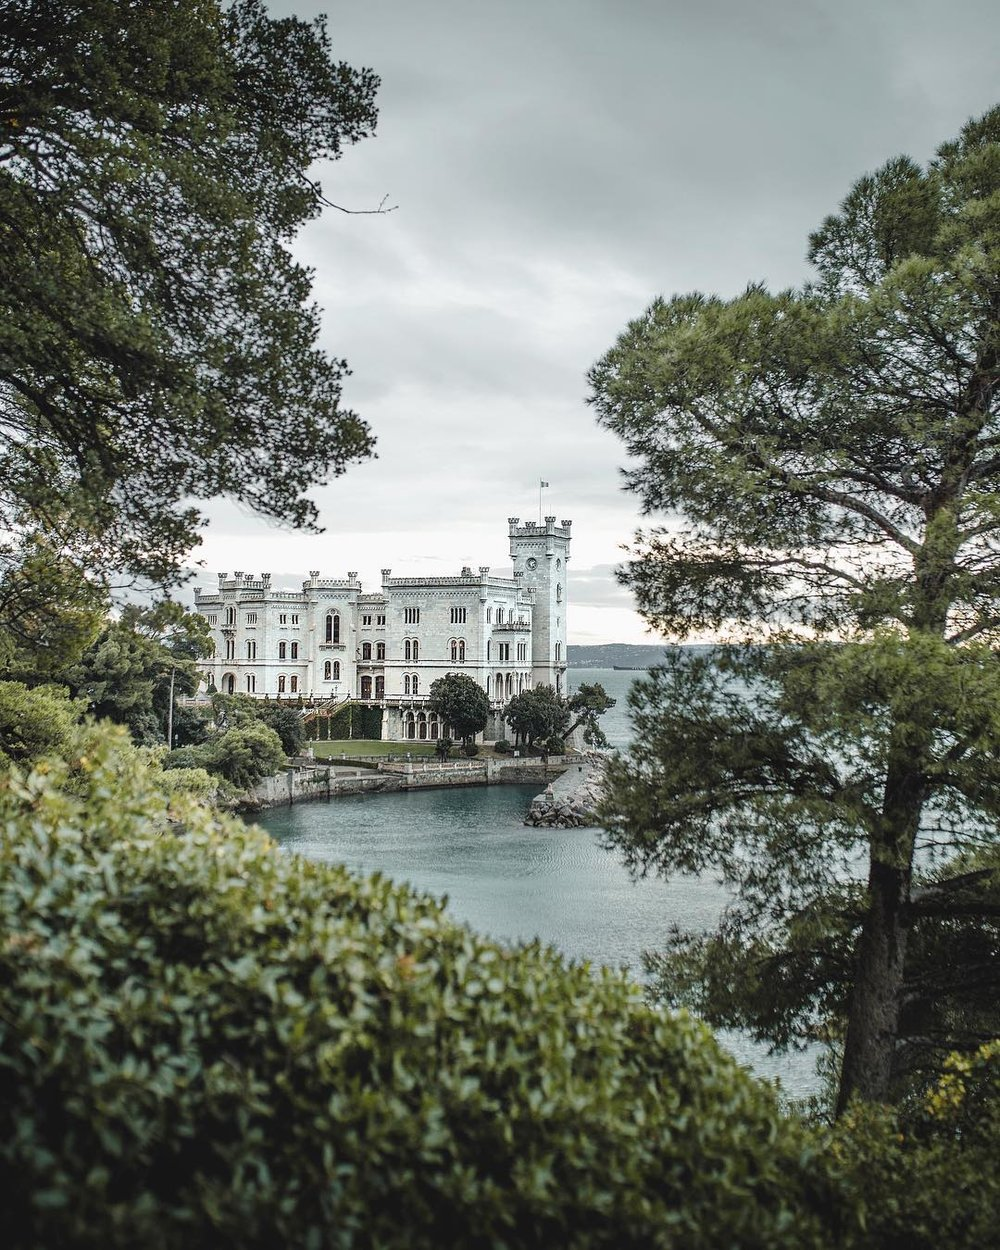 Trieste - Miramare